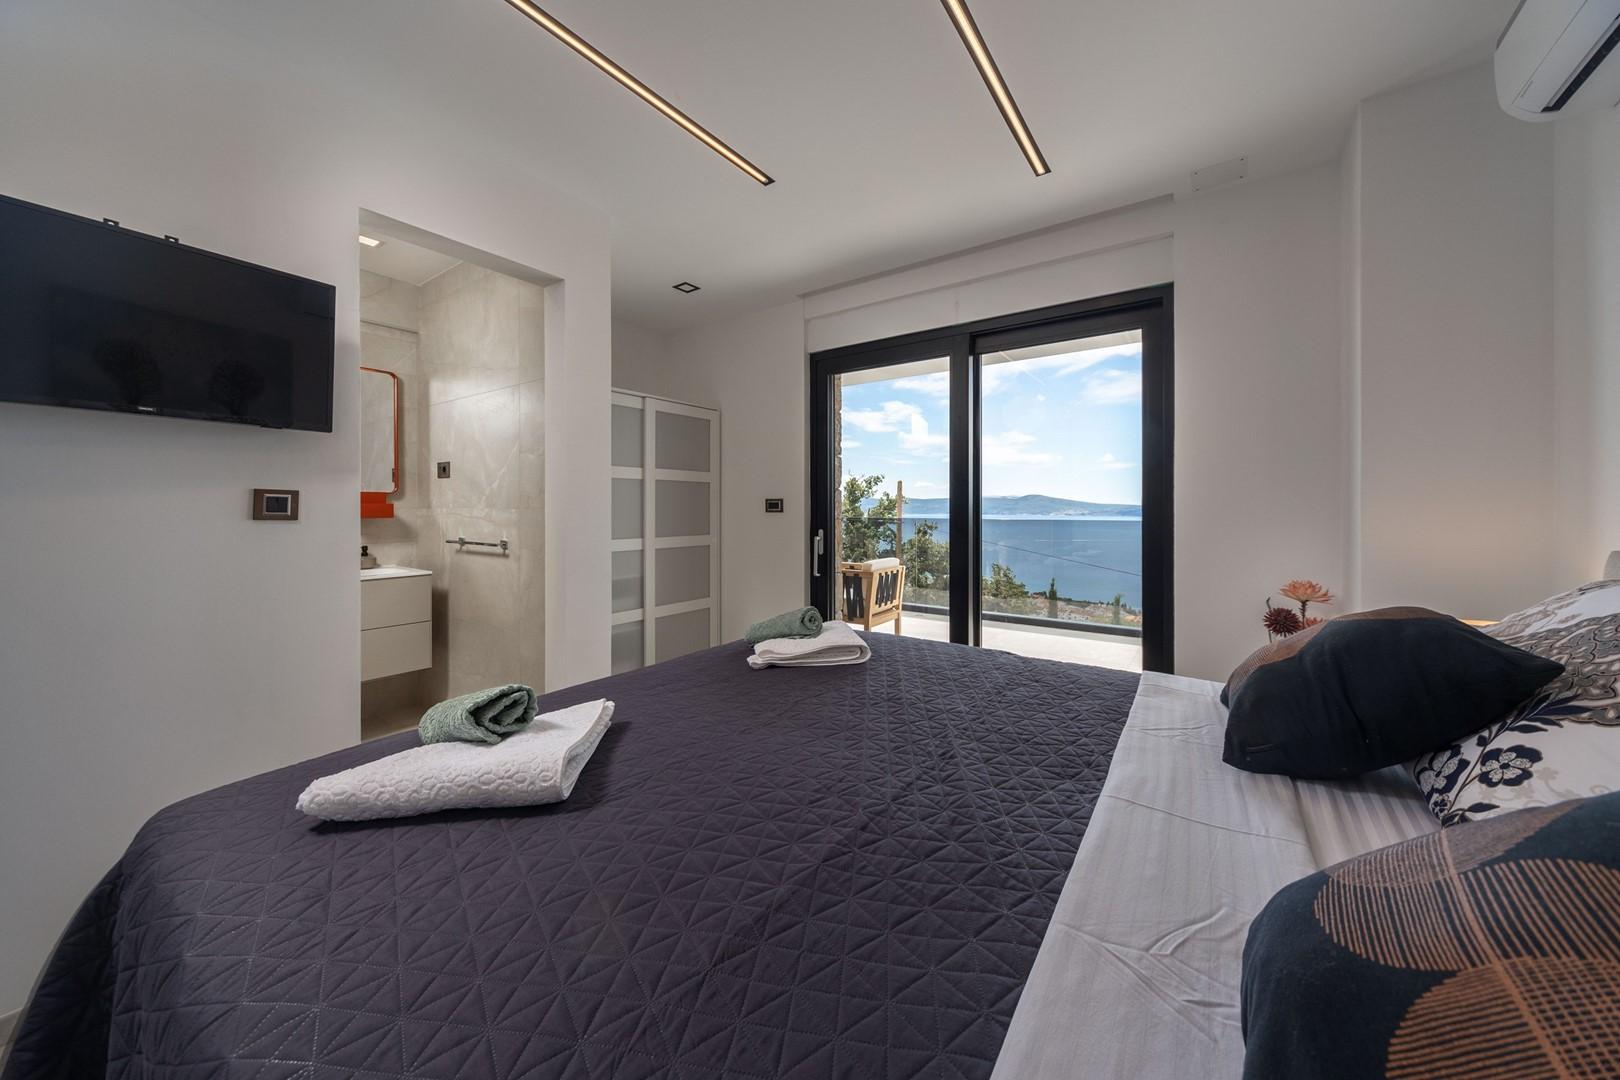 Maison de vacances Deluxe Villa Provvidenza with breathtaking Sea View (2819510), Crikvenica, , Kvarner, Croatie, image 35